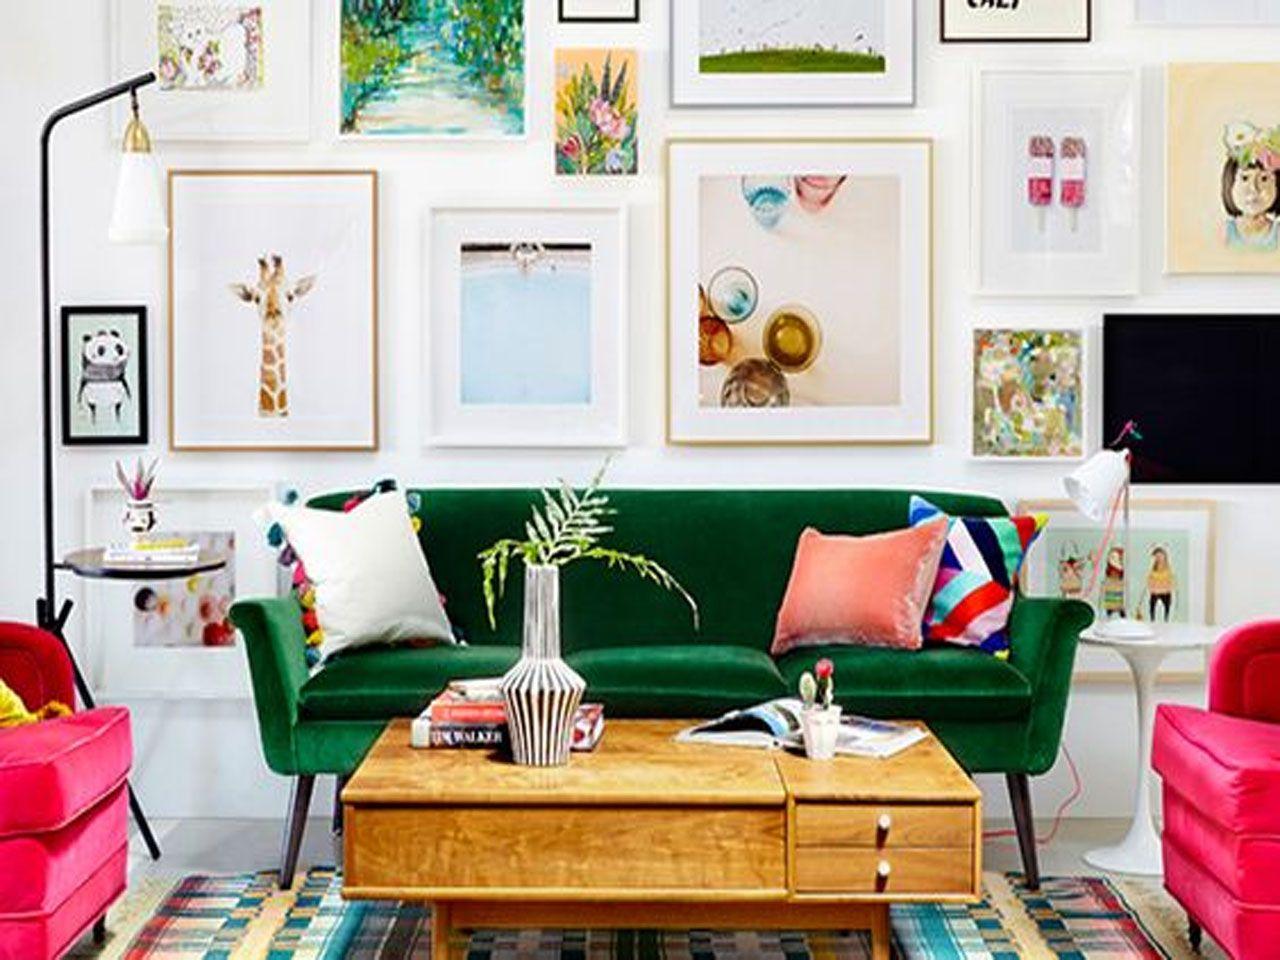 sofás para este verano verdes